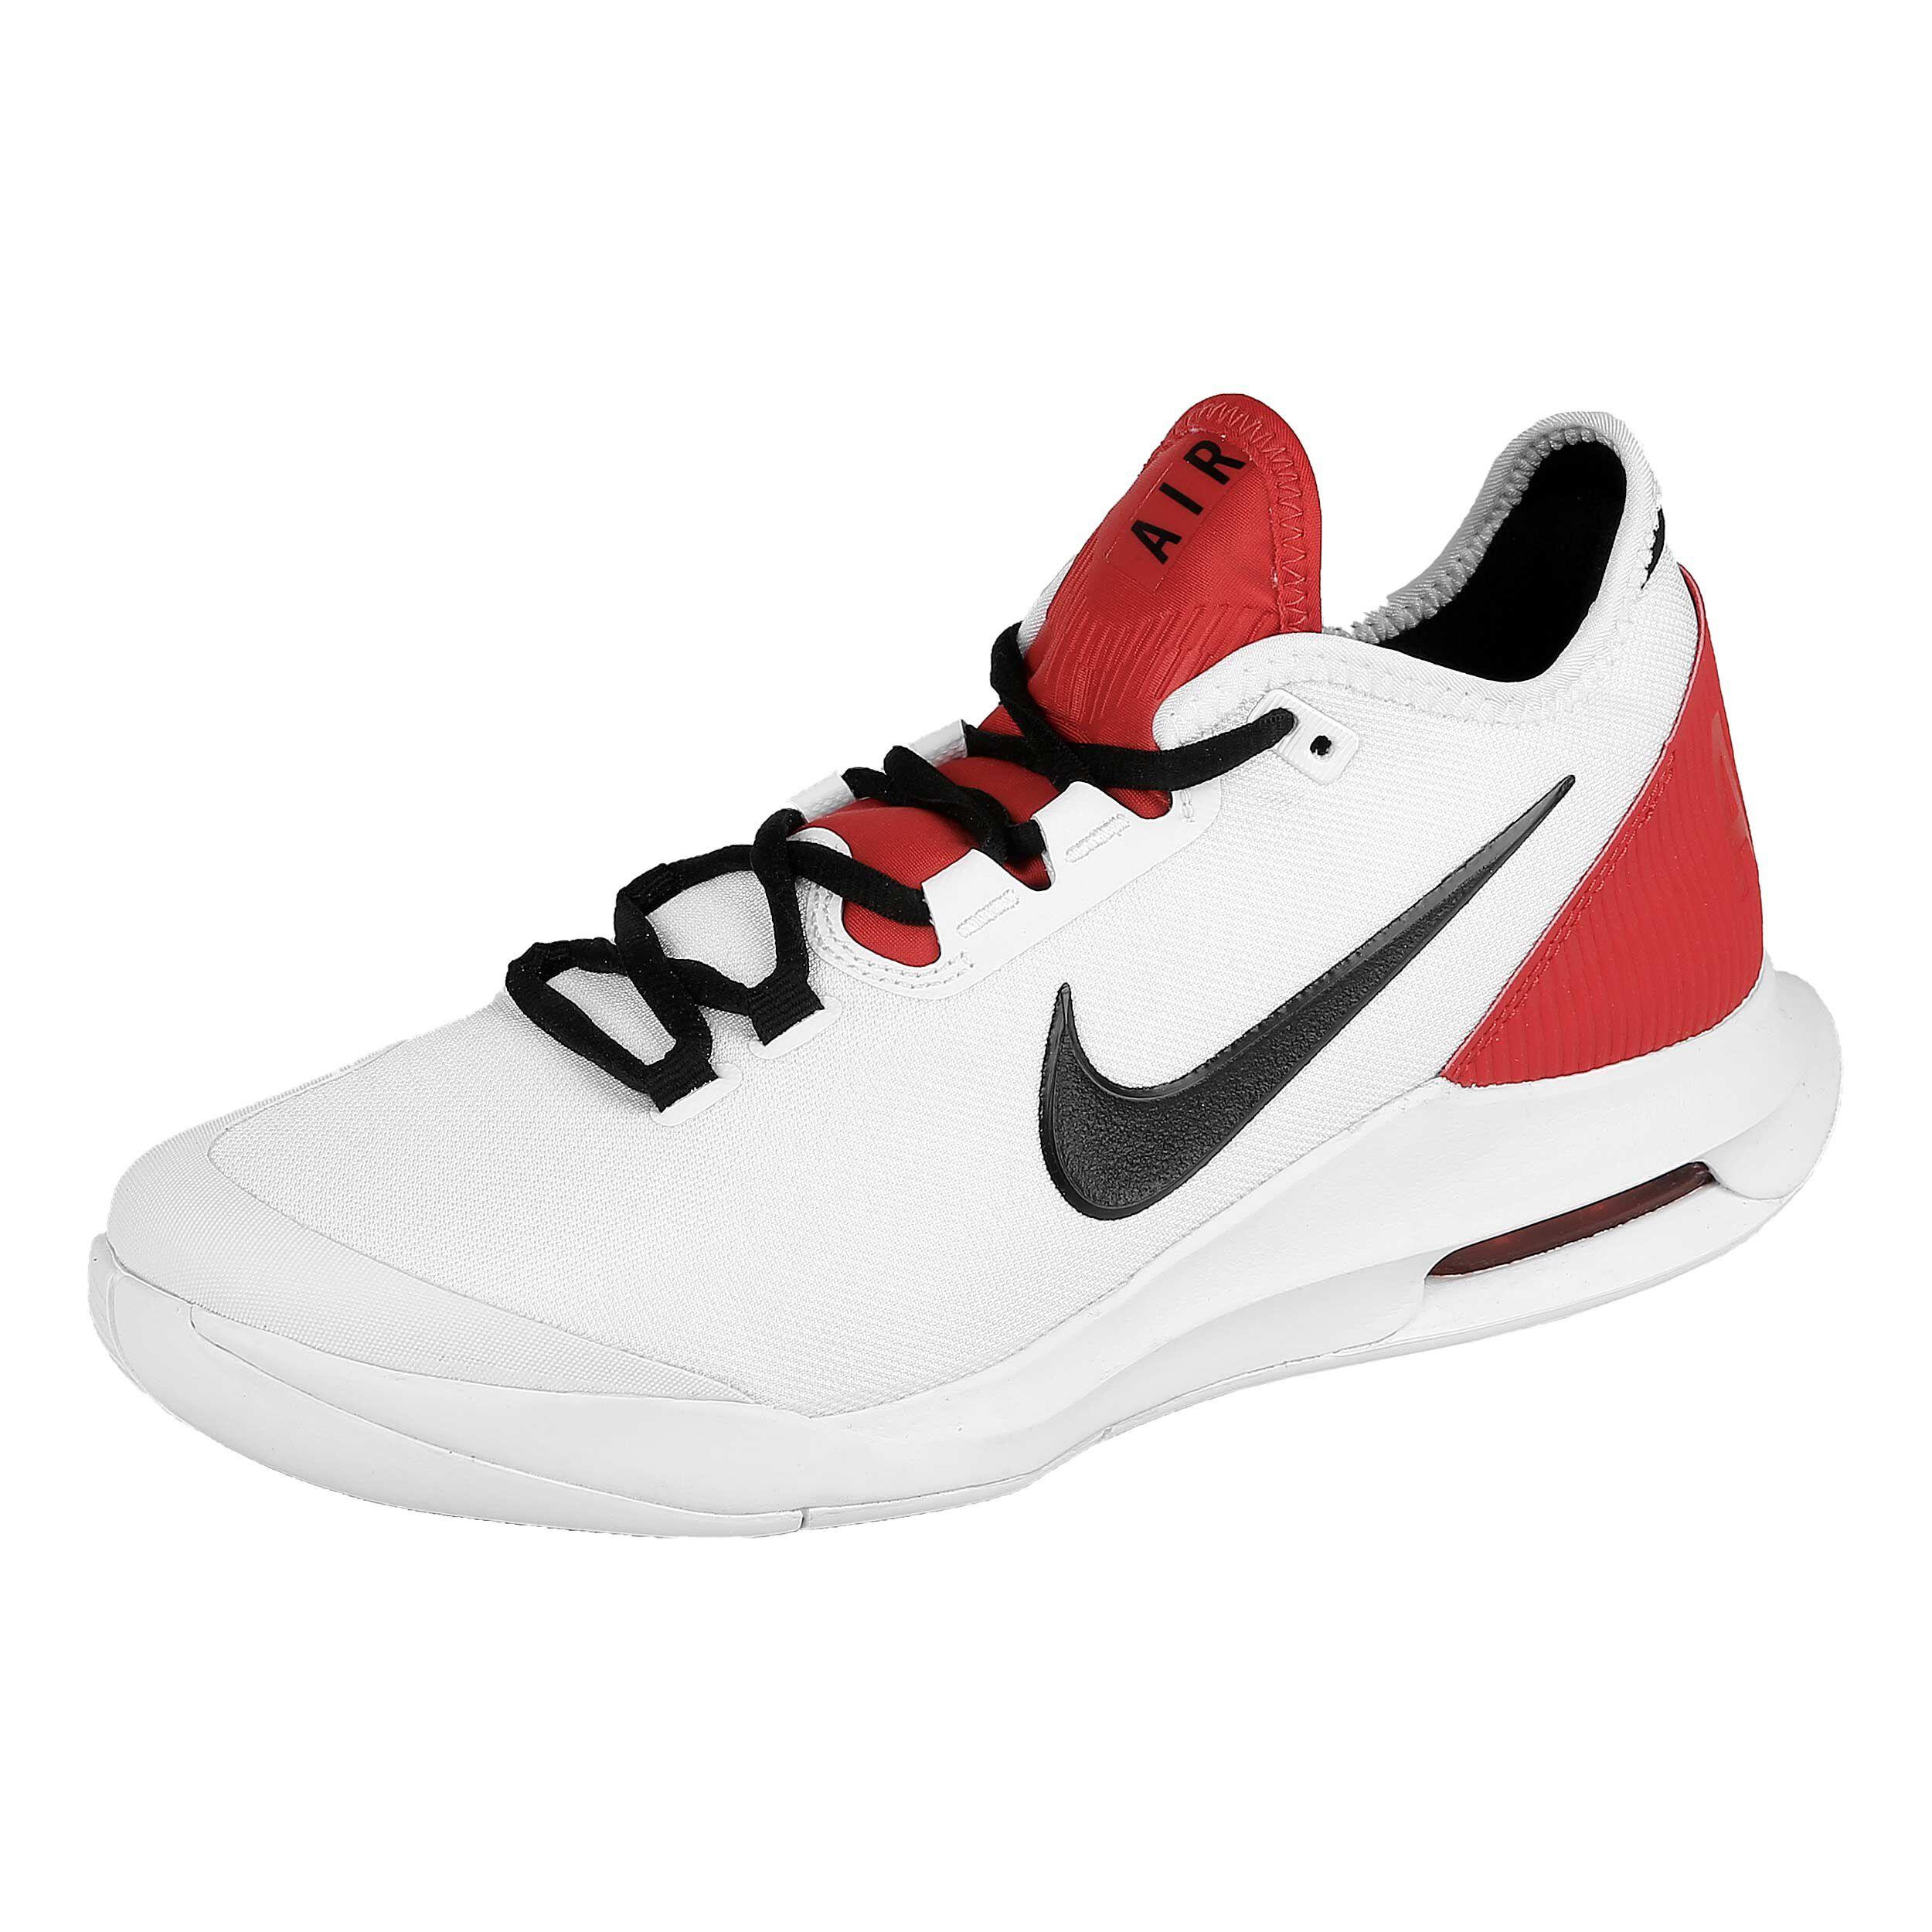 Nike Air Max Wildcard Allcourt Schoen Heren Wit, Rood